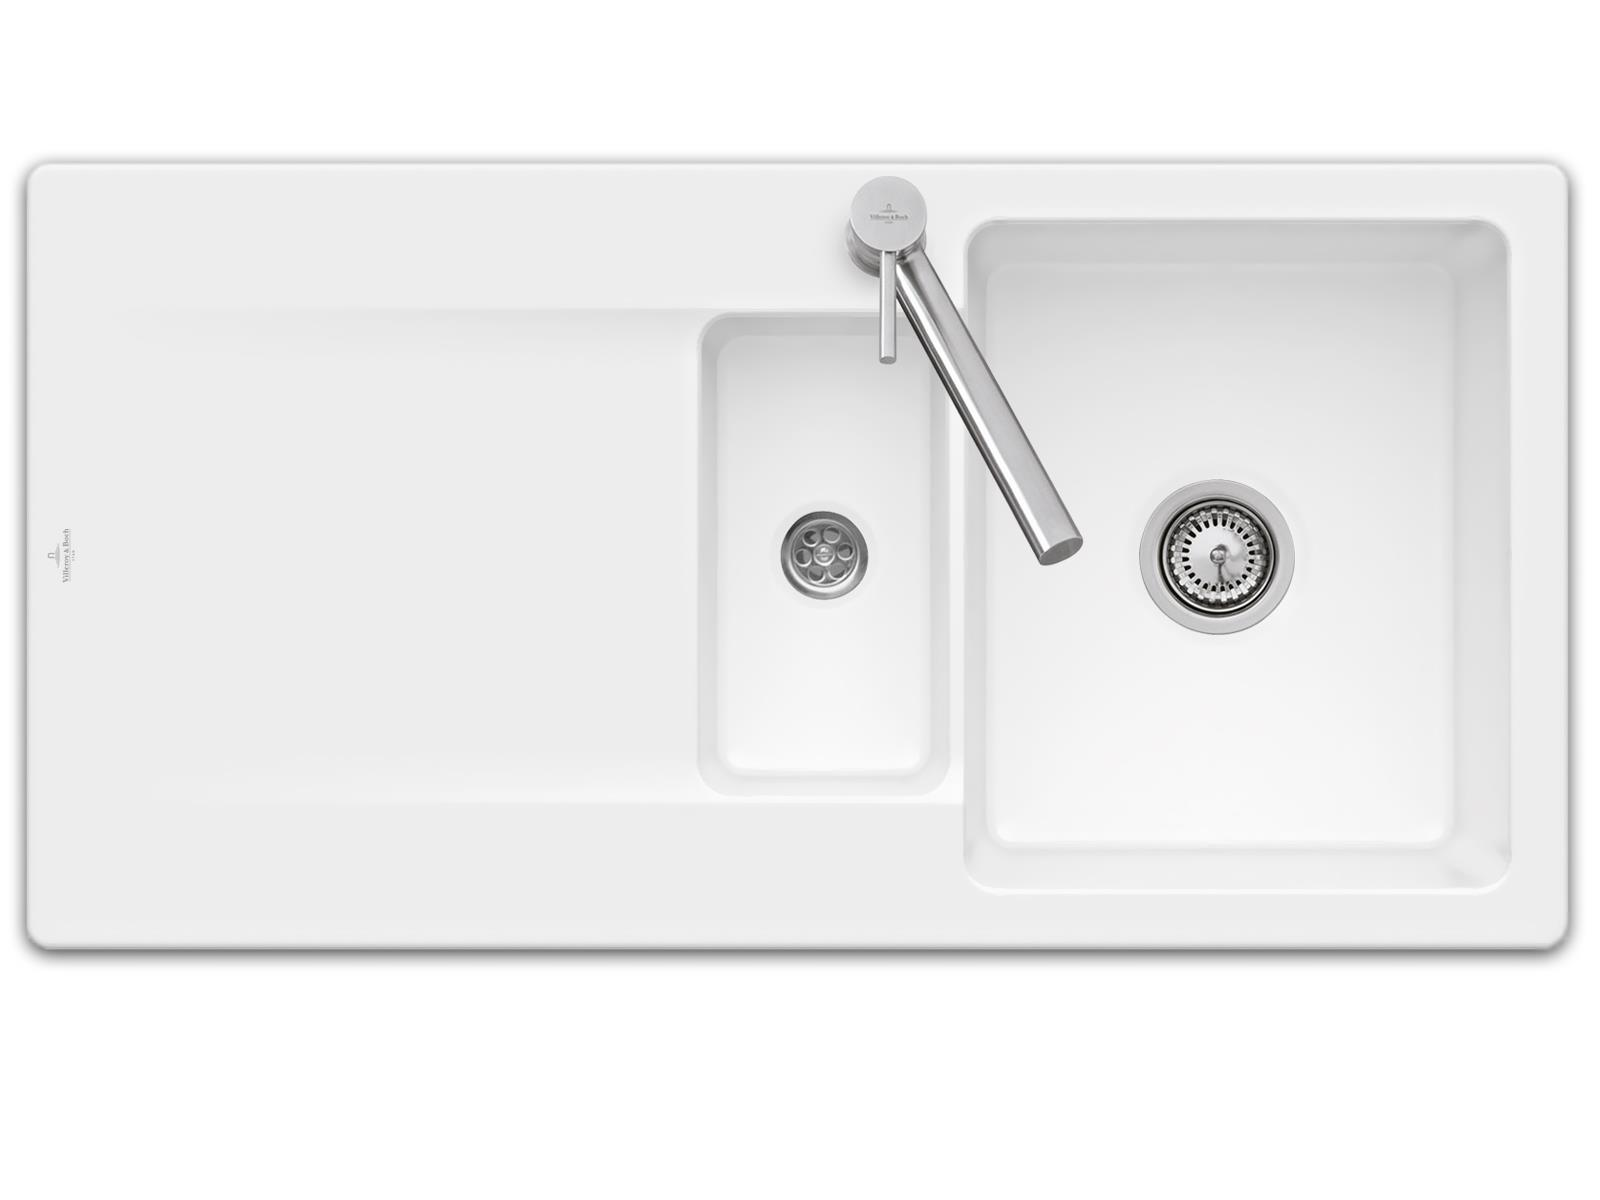 Villeroy & Boch Siluet 60 R - 3337 01 RW Stone White Keramikspüle Handbetätigung